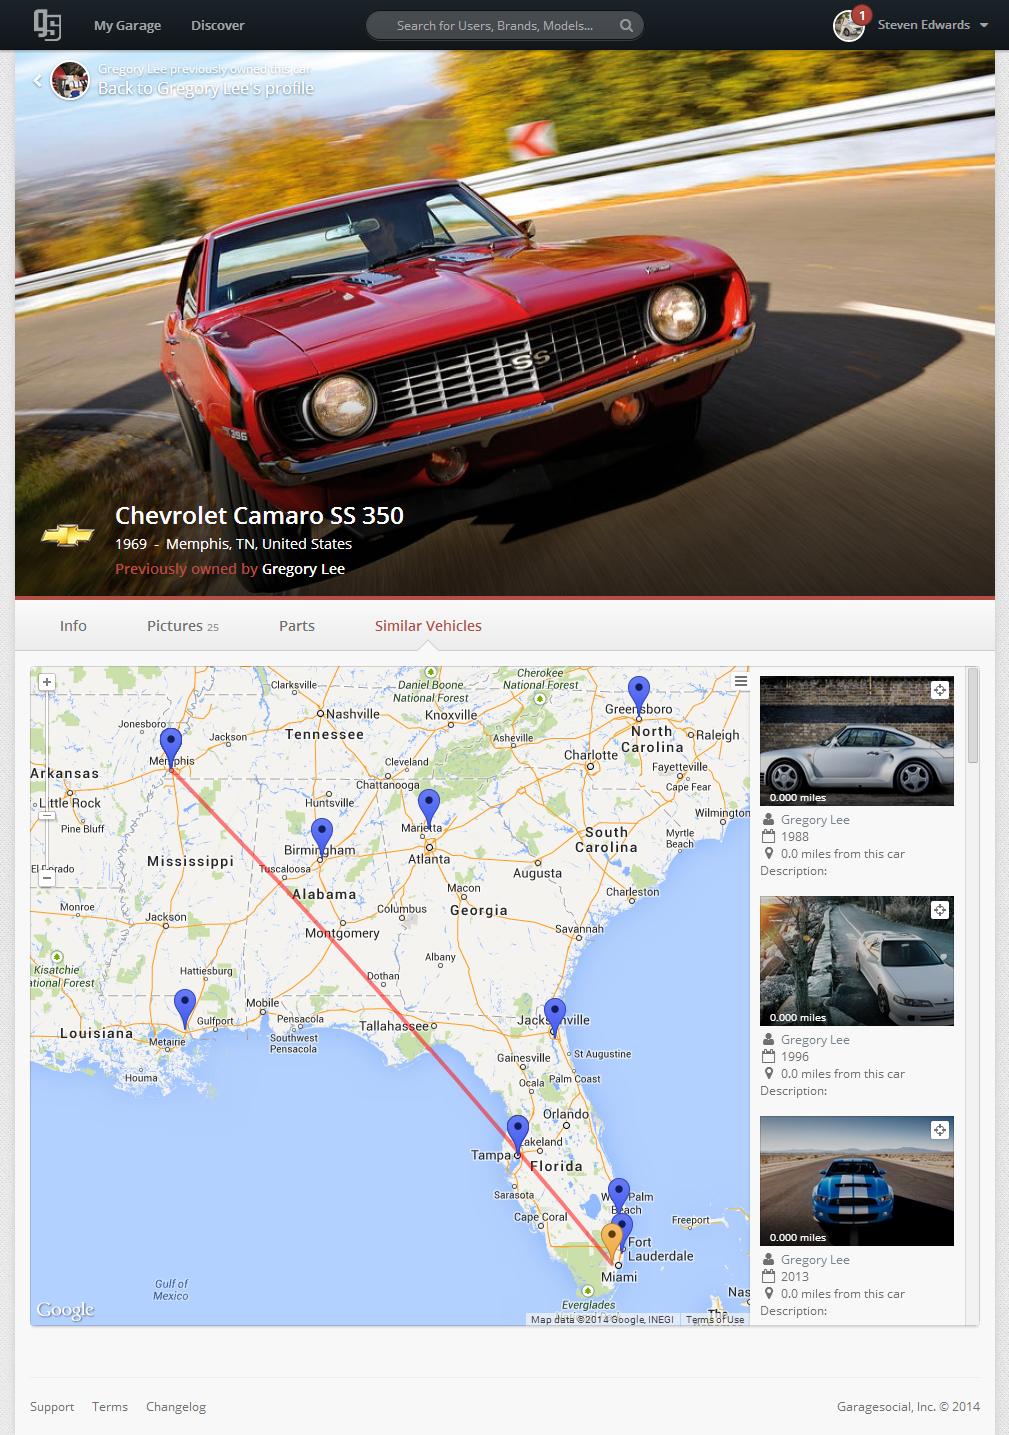 Chevrolet Camaro SS 350 Map